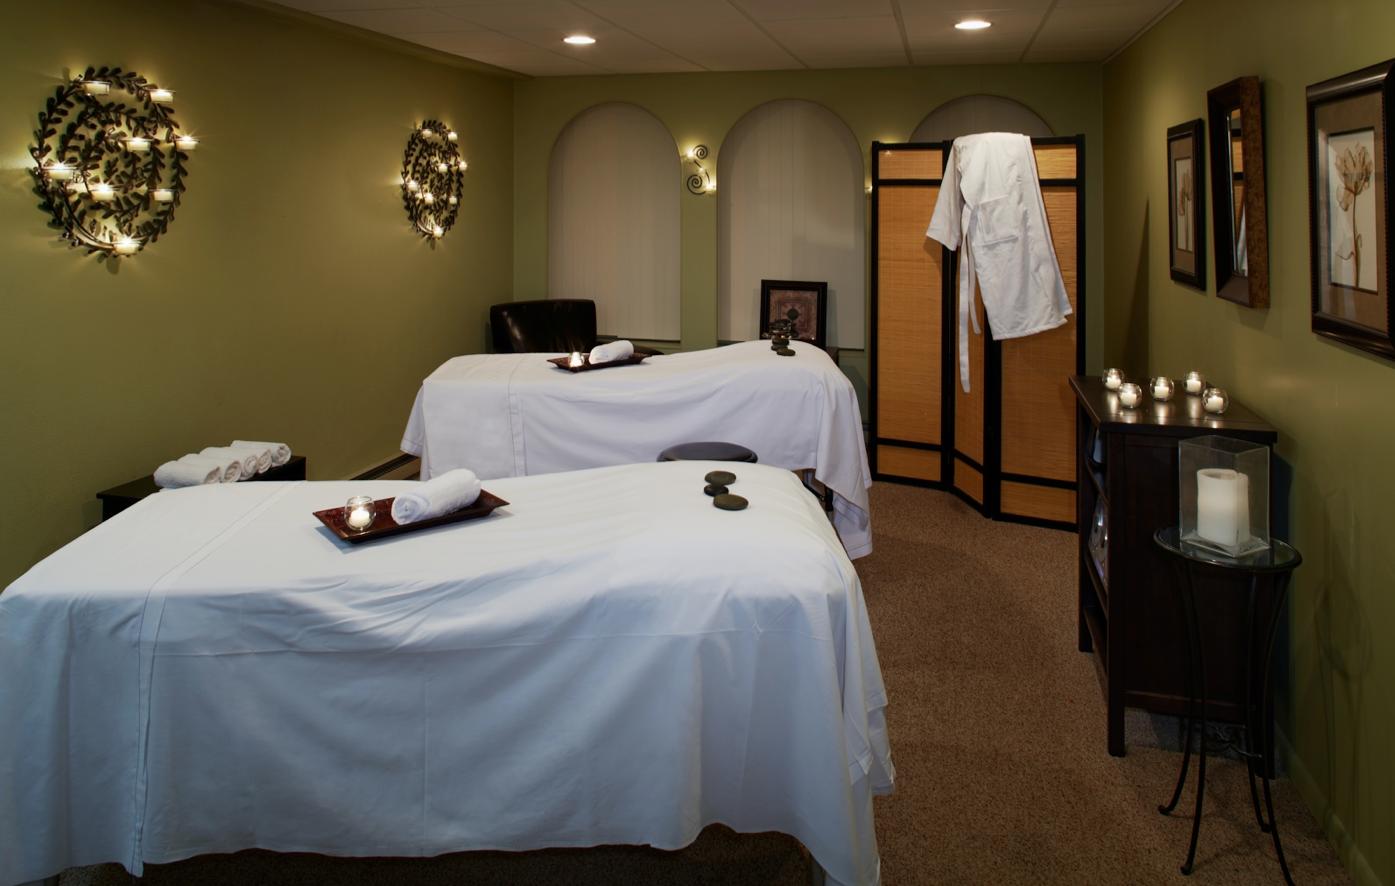 Pocono Resort Spas Cove Pocono Entertainment Resorts Spa Rooms Spa Design Inspiration Spa Decor